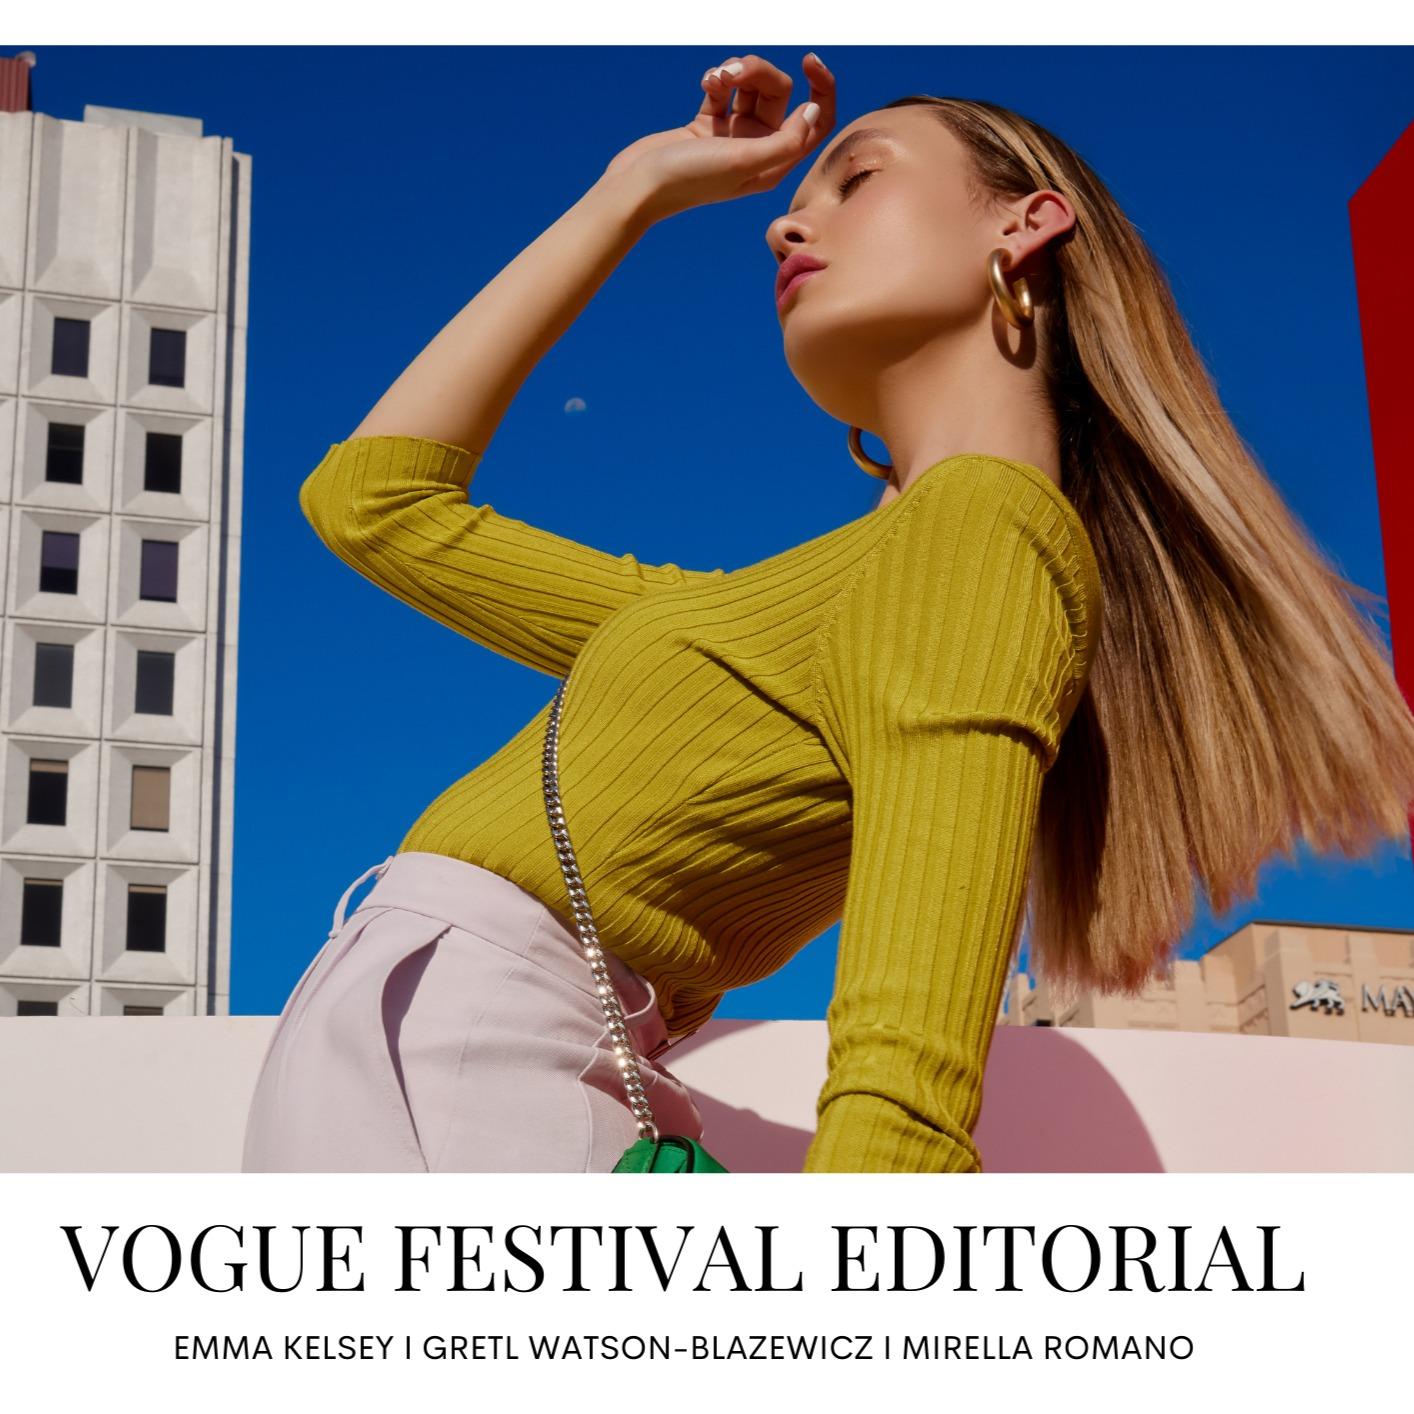 EMMA KELSEY X VOGUE FESTIVAL for the SUNDAY MAIL | The Models blog